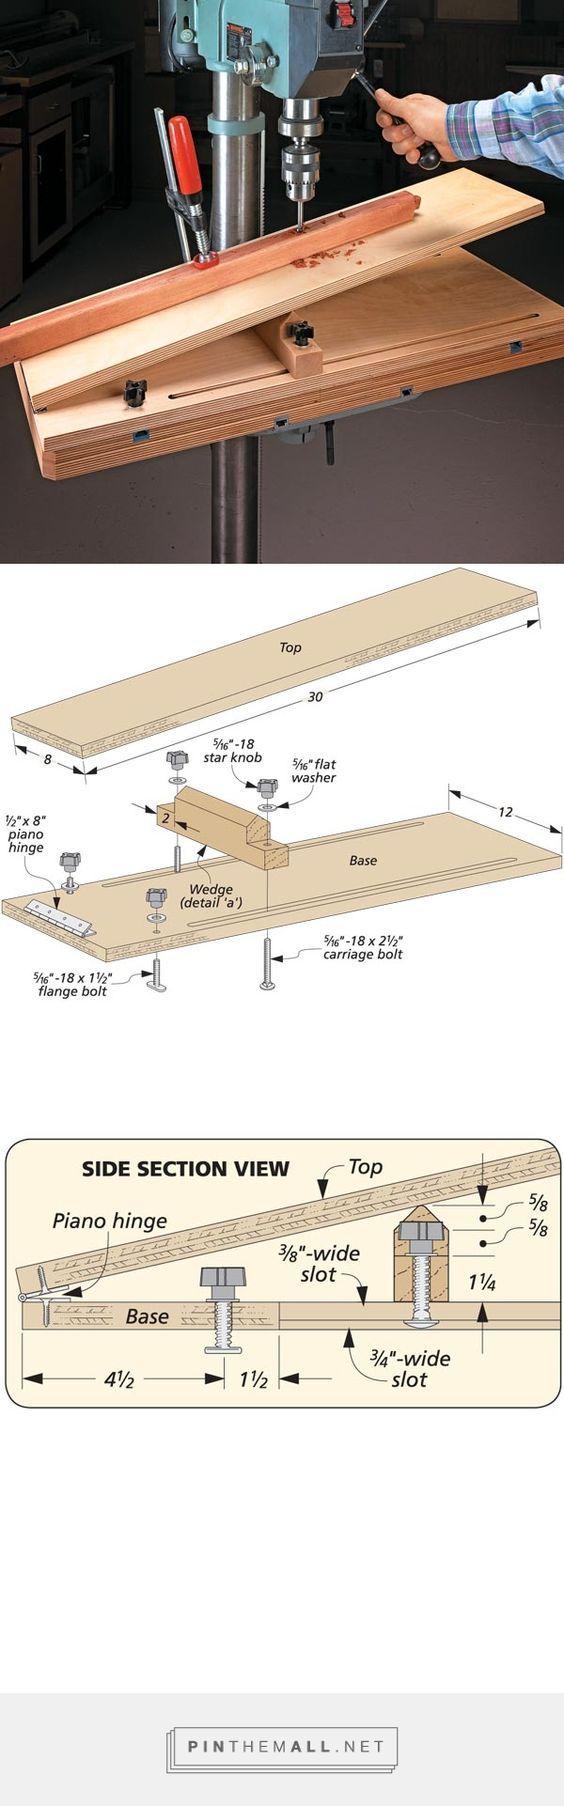 Handy Drill Press Jig | Woodsmith Tips - created via http://pinthemall.net: